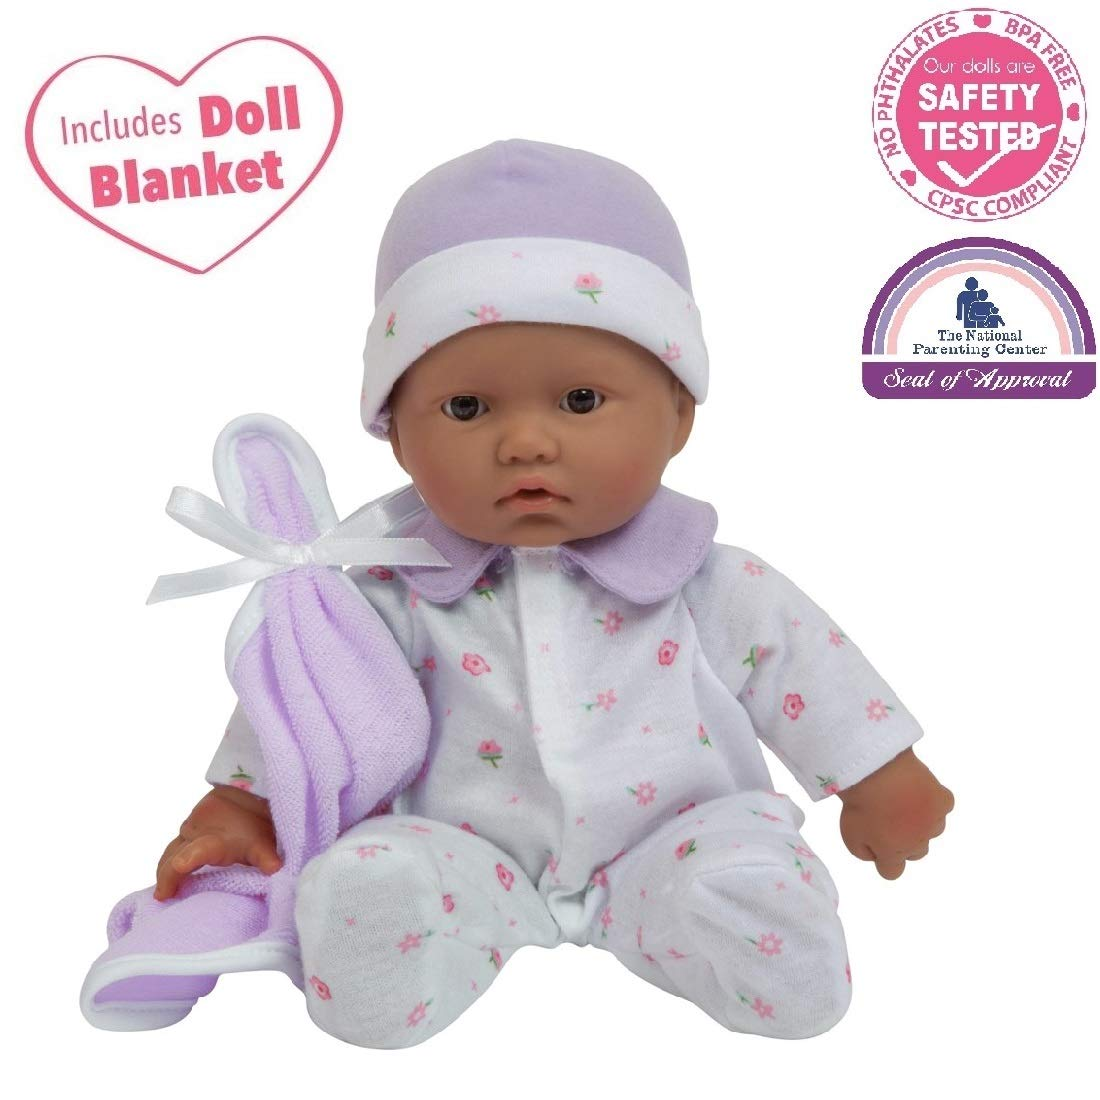 JC Toys, La Baby 11-inch Hispanic Washable Soft Body Play Doll For Kid